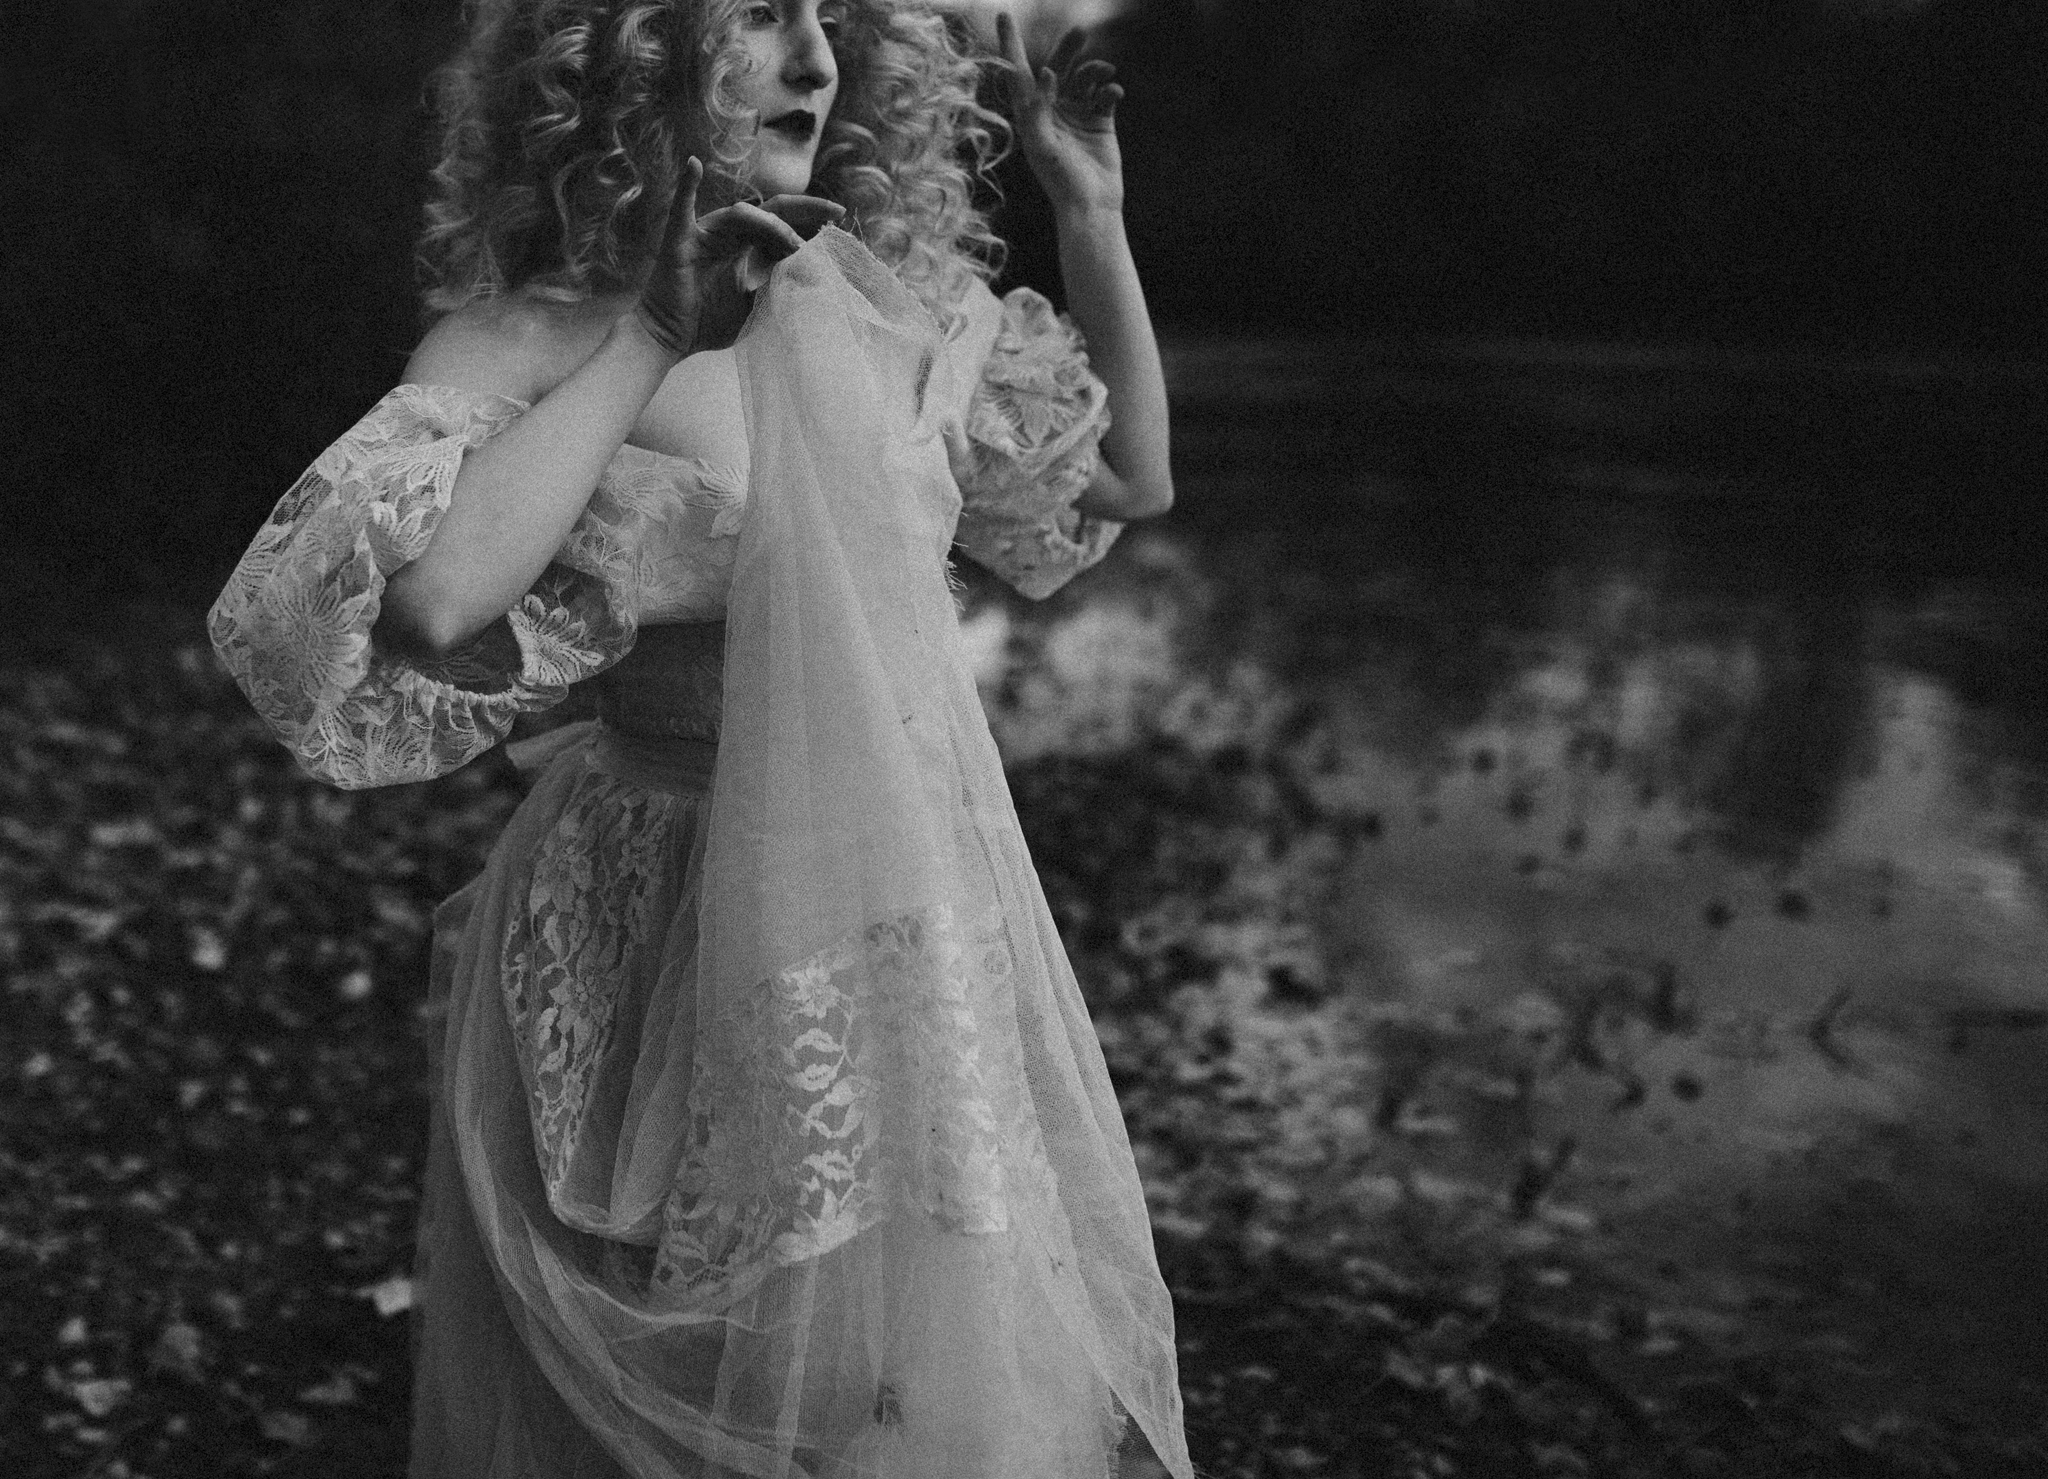 pale-witch-253fb.jpg